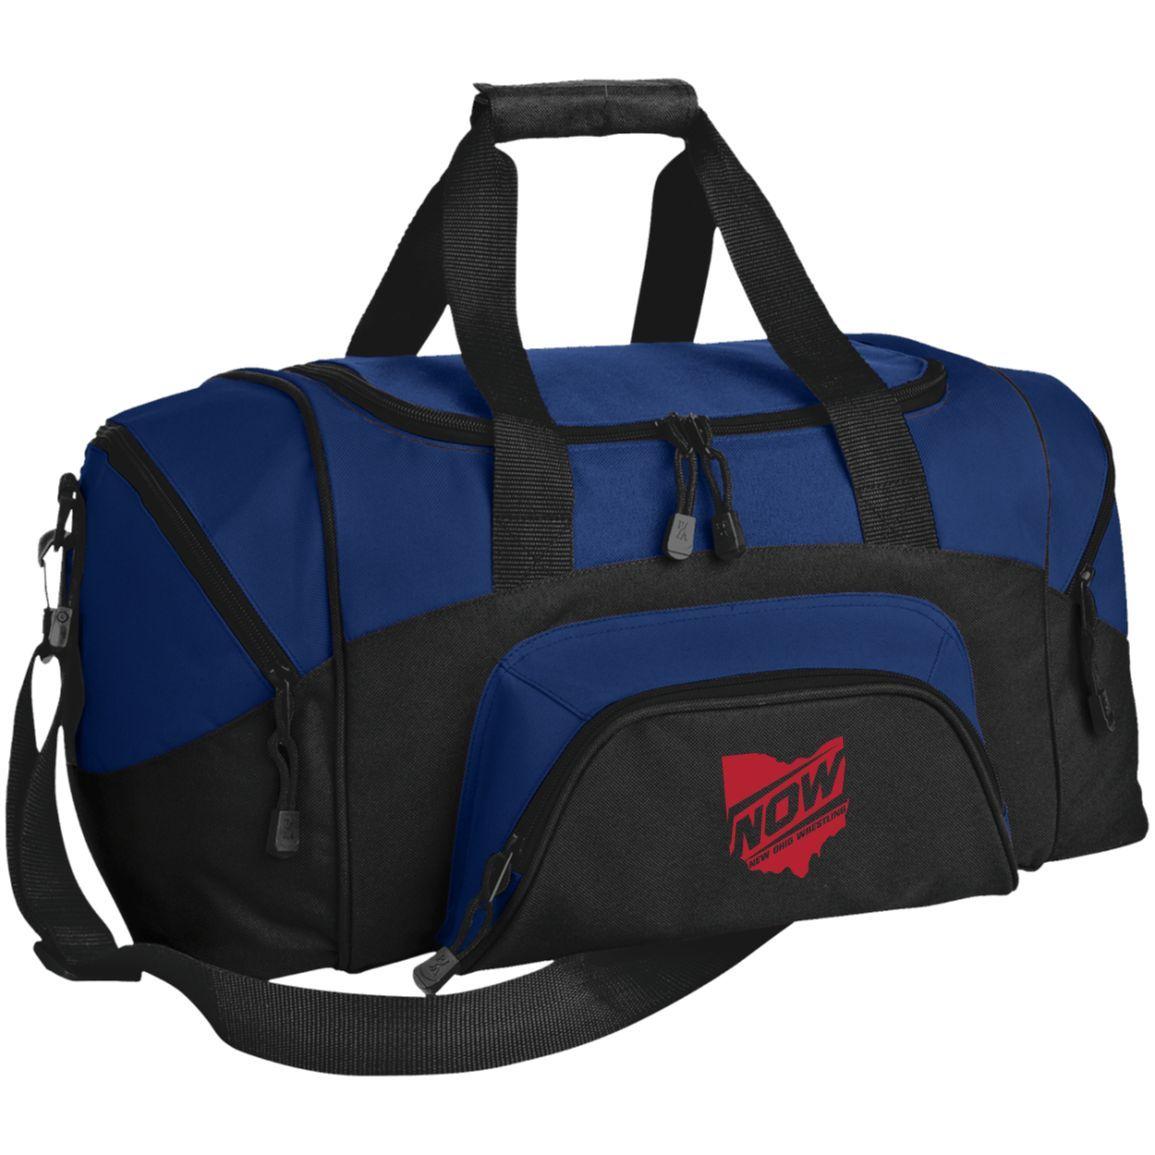 New Ohio Wrestling BG990S Port & Co. Small Colorblock Sport Duffel Bag